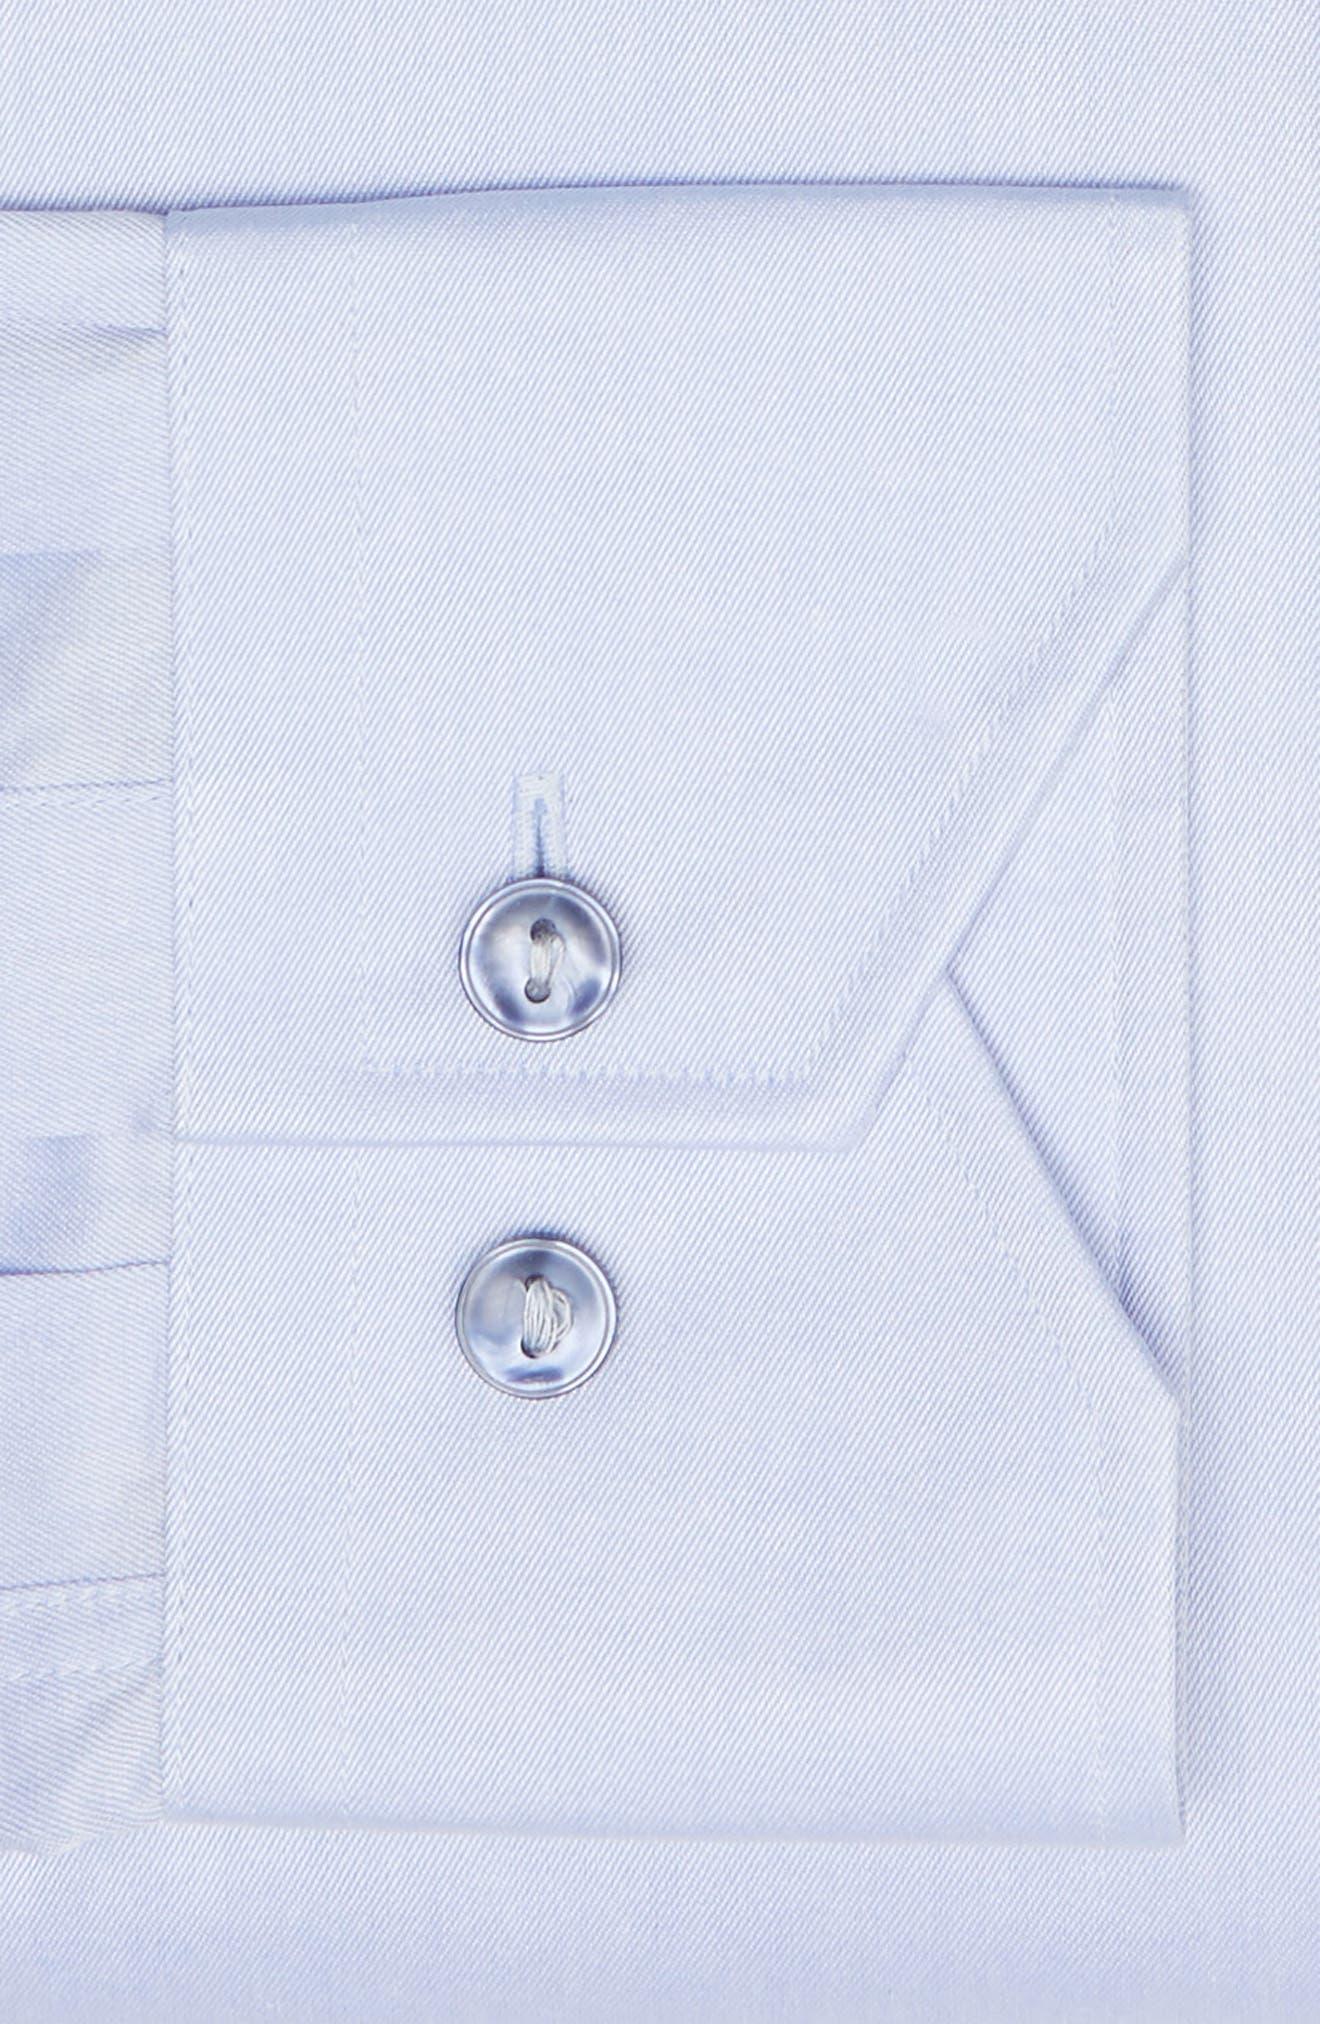 LORENZO UOMO,                             Trim Fit Solid Dress Shirt,                             Alternate thumbnail 6, color,                             LIGHT BLUE